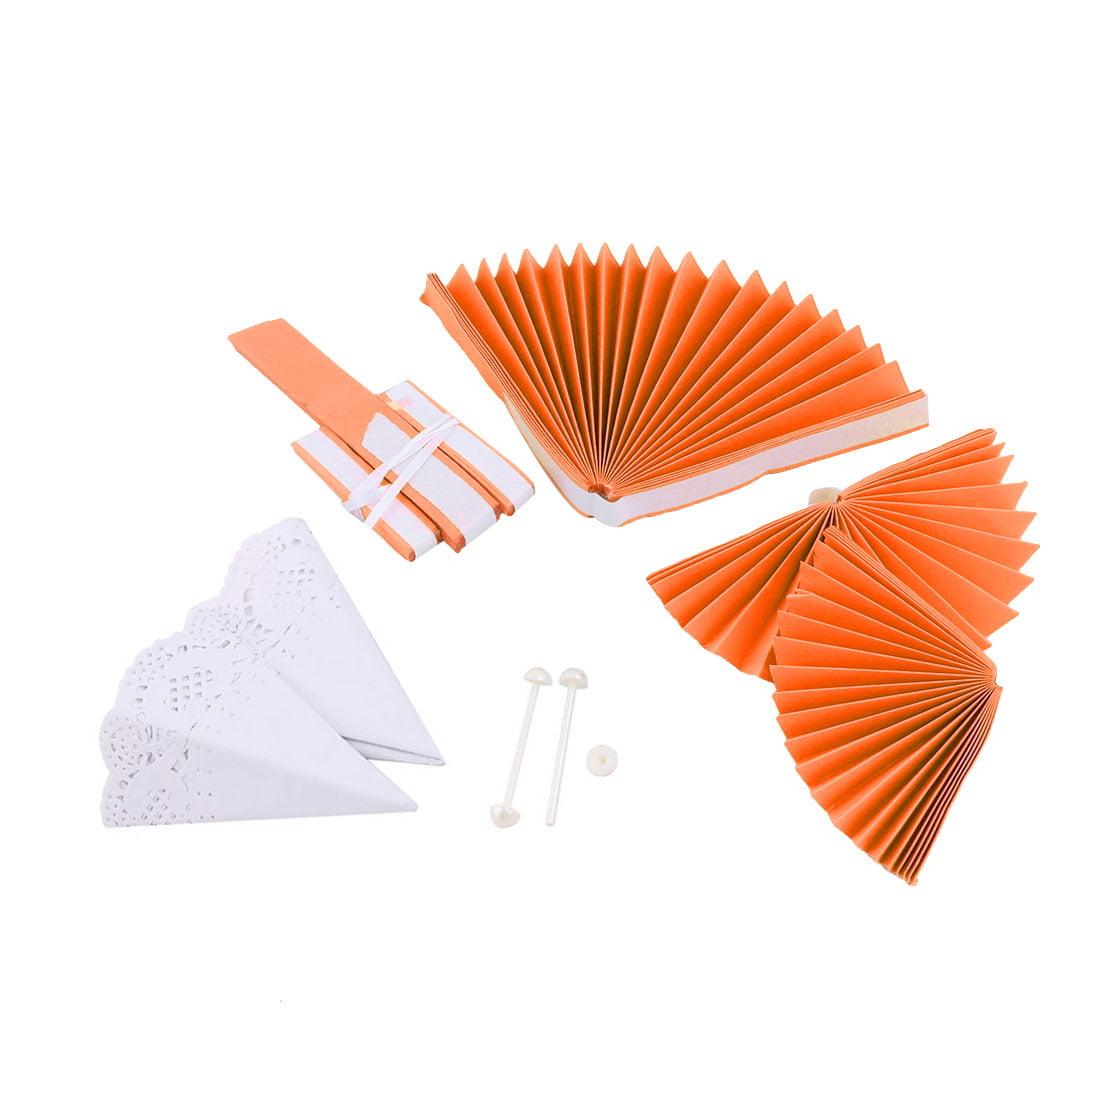 Wedding Party Paper Round DIY Handcraft Hanging Decor Rotating Fan Orange 2pcs